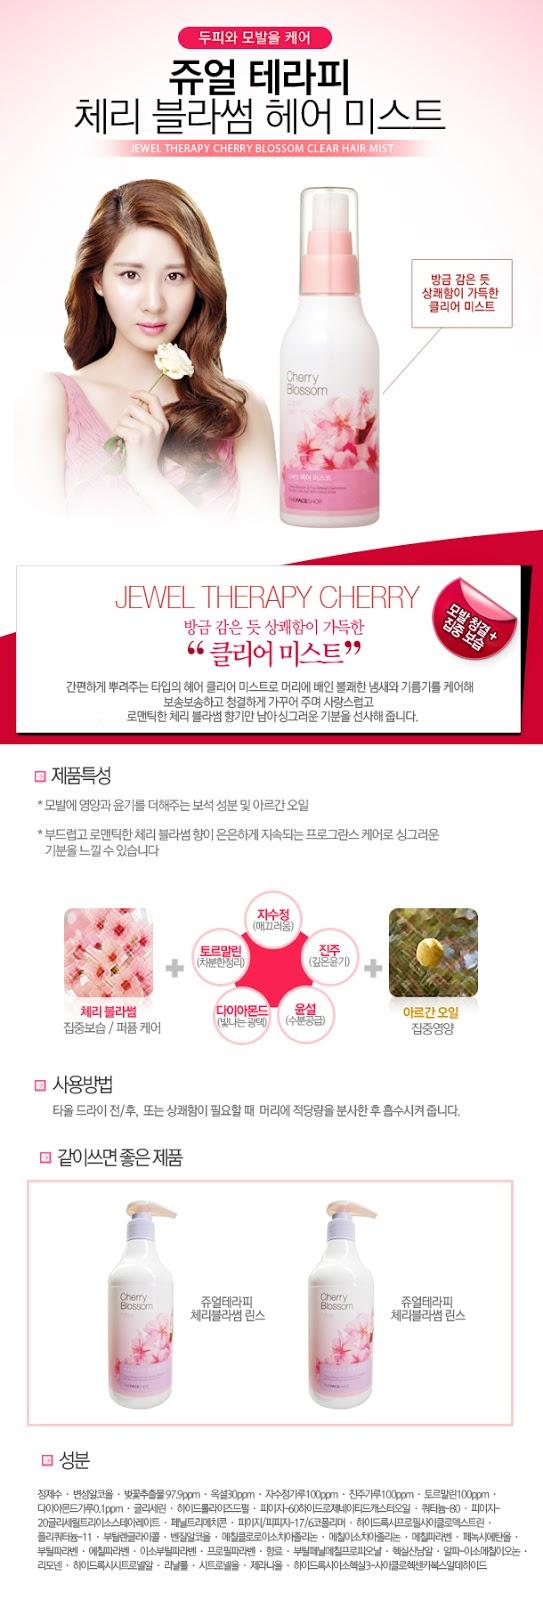 [PICS] Seohyun - The Face Shop Promotion Picture HD ♥ - Página 3 Seohyuntfs